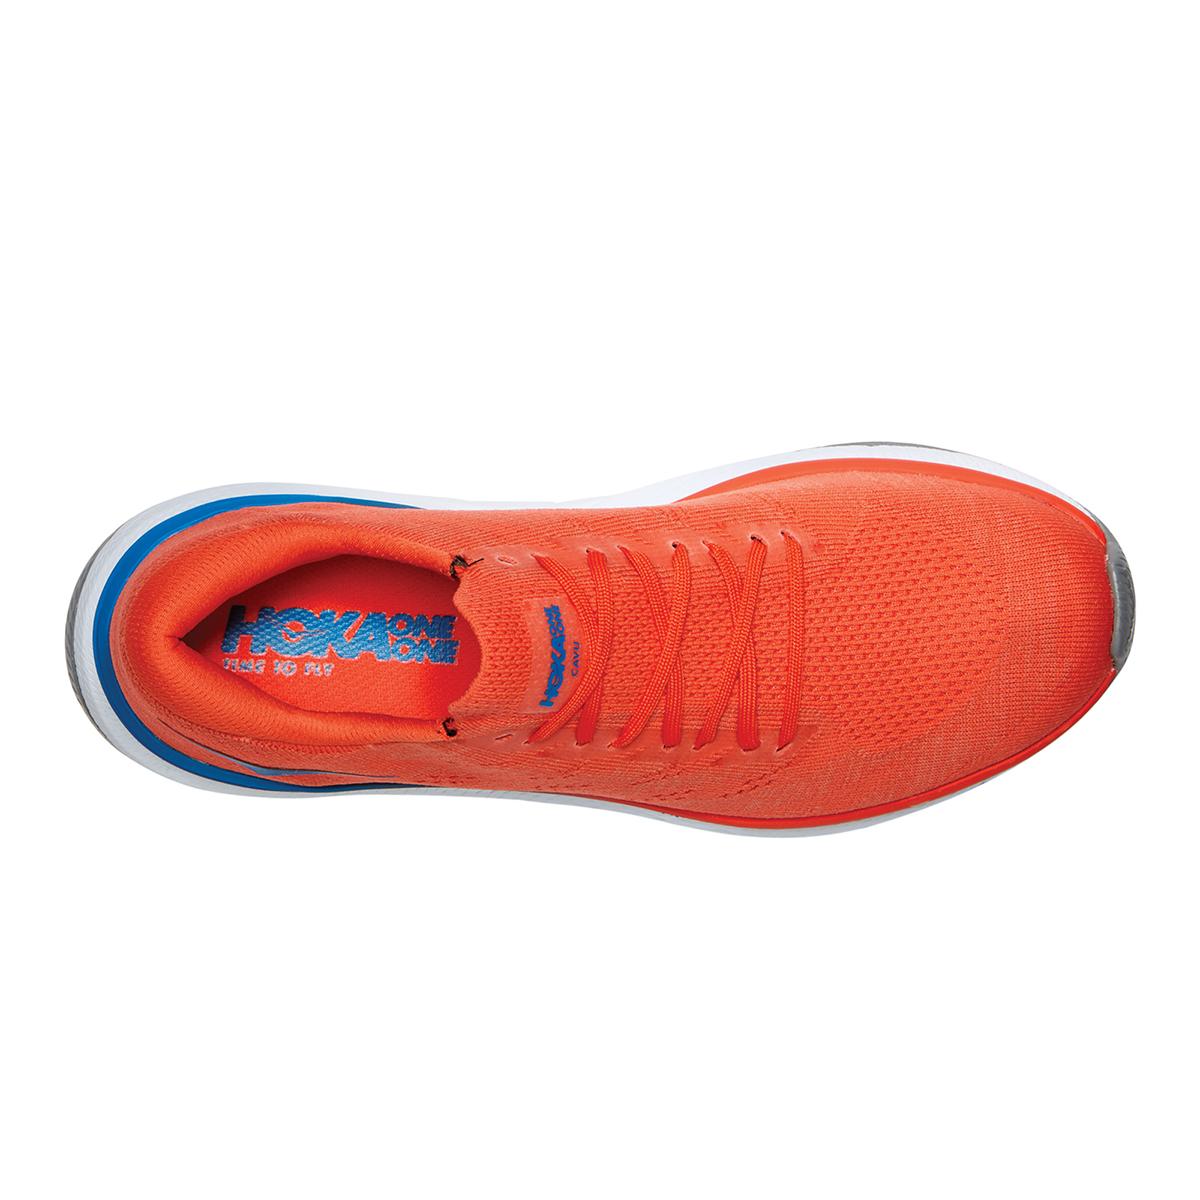 Men's Hoka One One Cavu 3 Running Shoe - Color: Mandarin Red/White - Size: 7 - Width: Regular, Mandarin Red/White, large, image 3